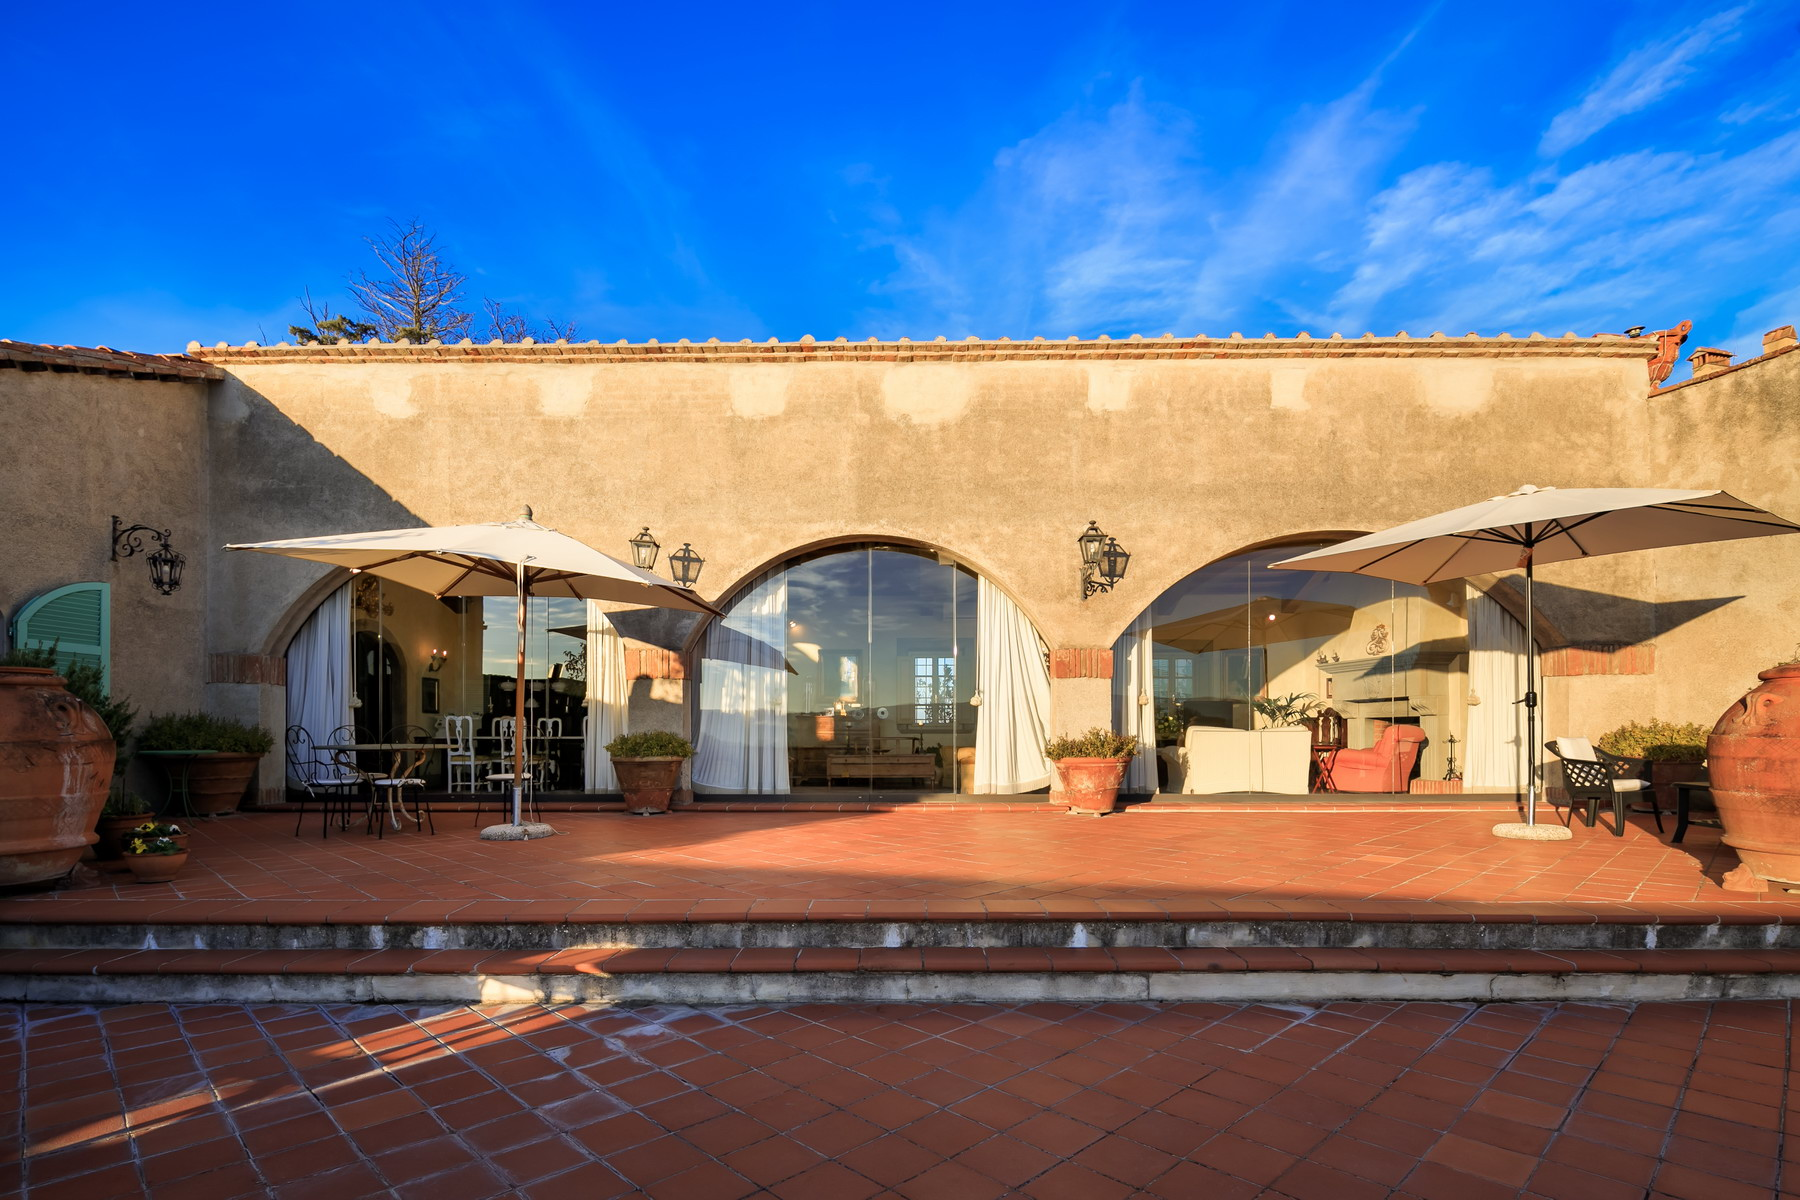 Villa in Vendita a Casciana Terme Lari: 5 locali, 550 mq - Foto 9